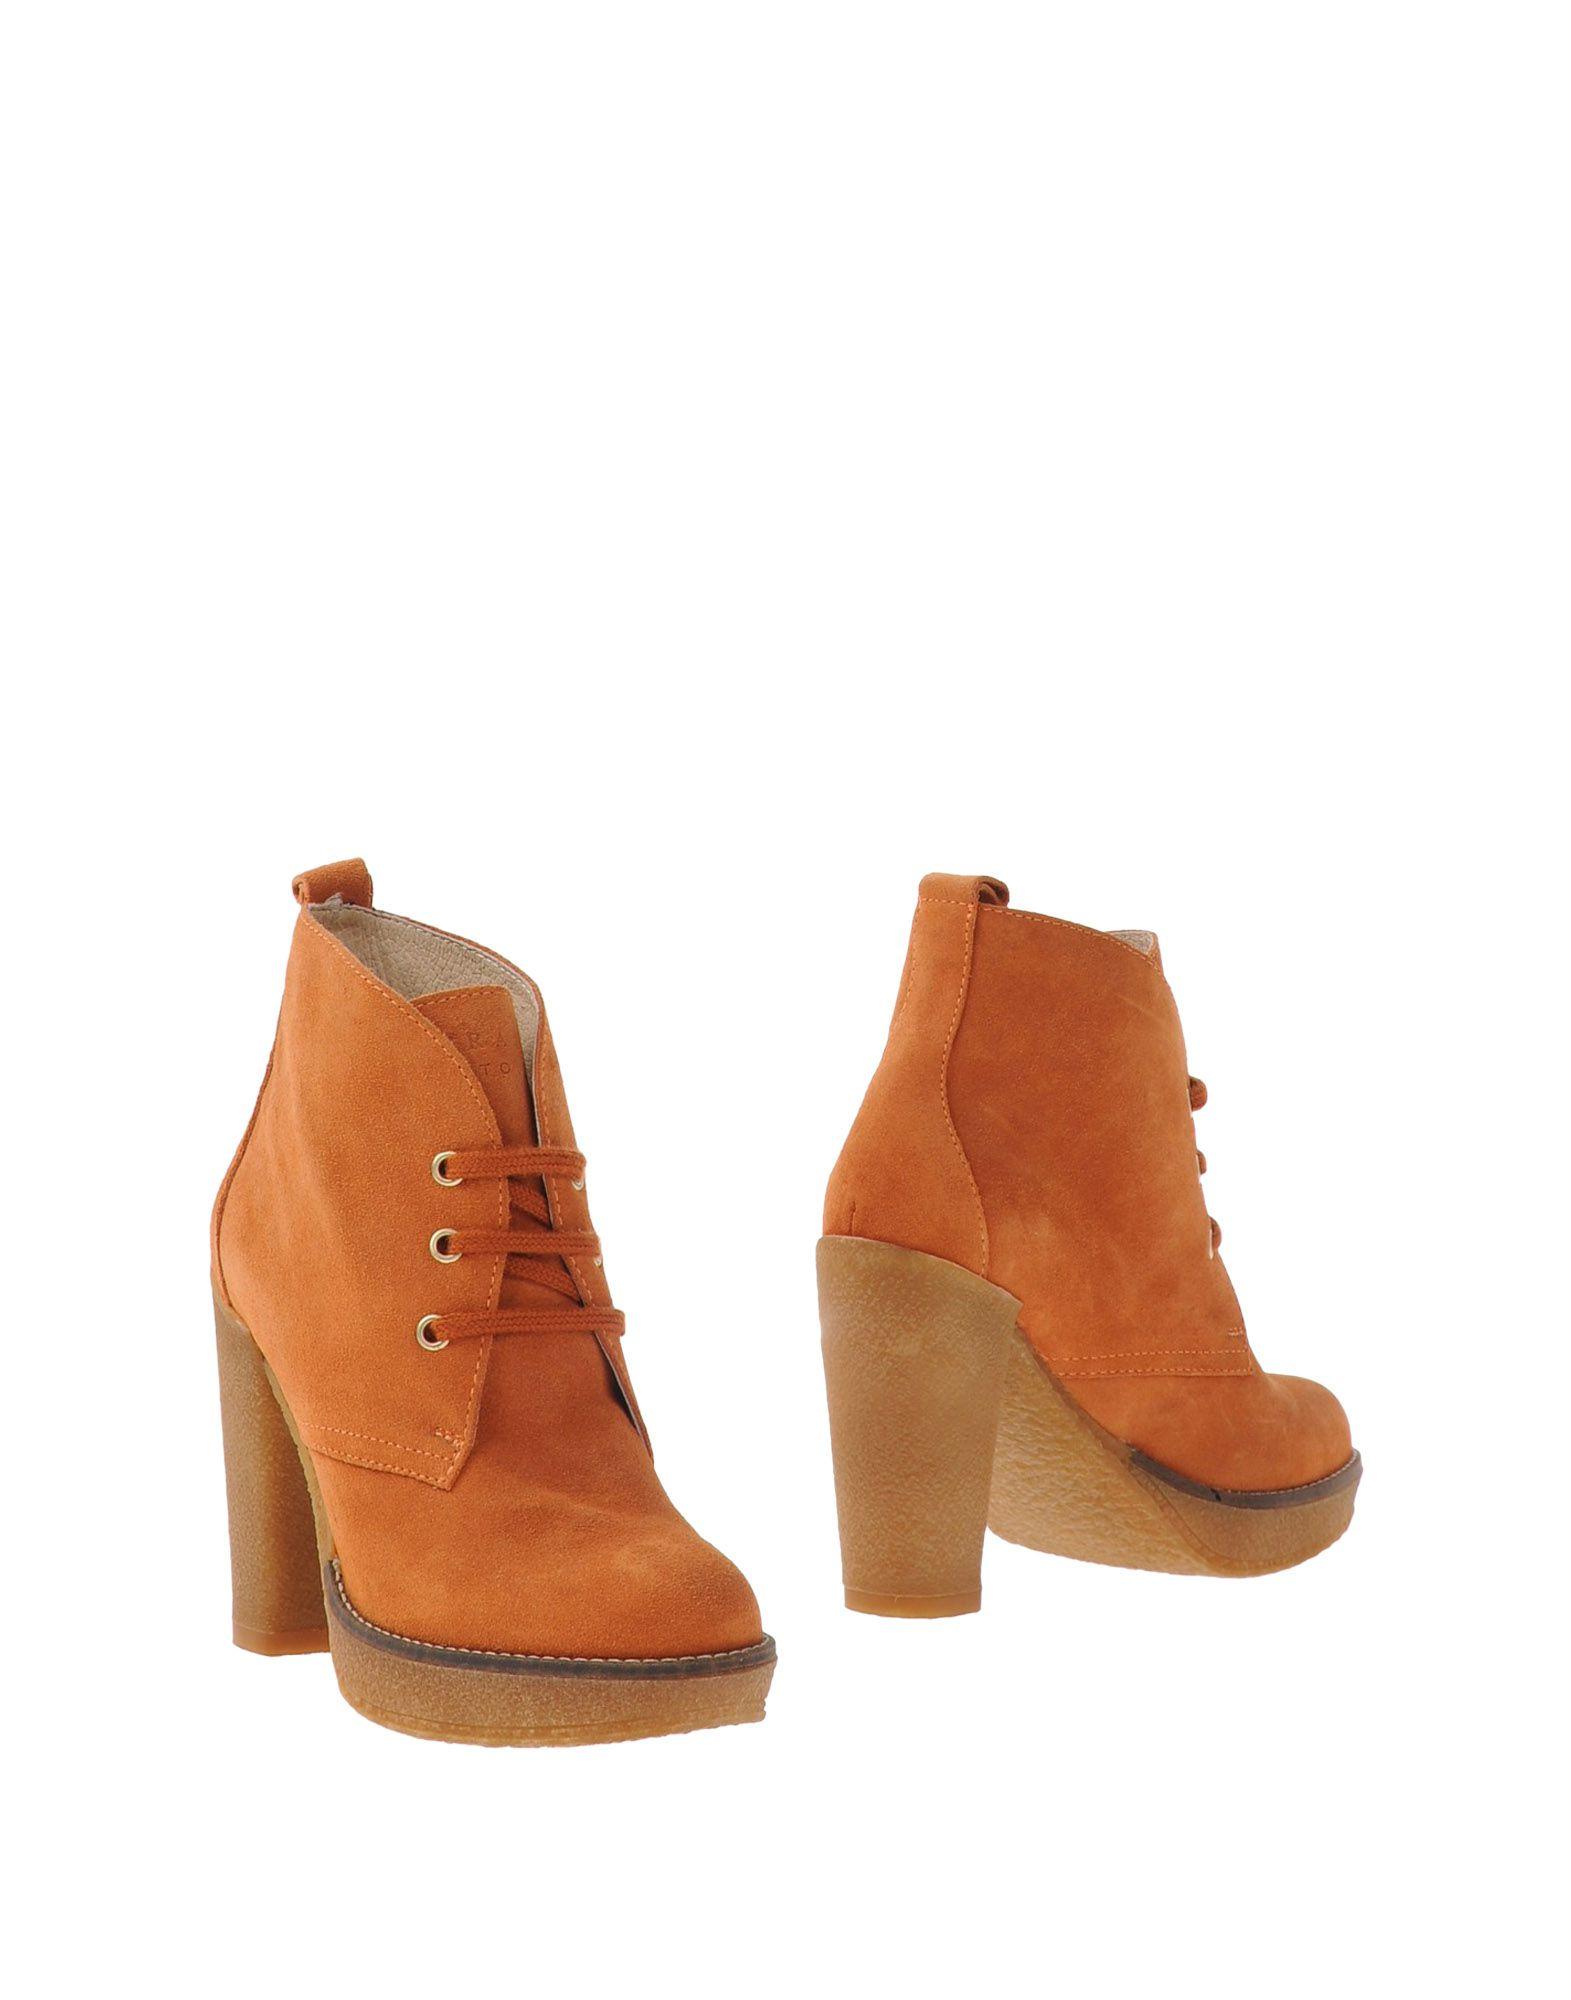 Gut um billige Schuhe Damen zu tragenSerafini Etoile Stiefelette Damen Schuhe  11062431BK ce0e23